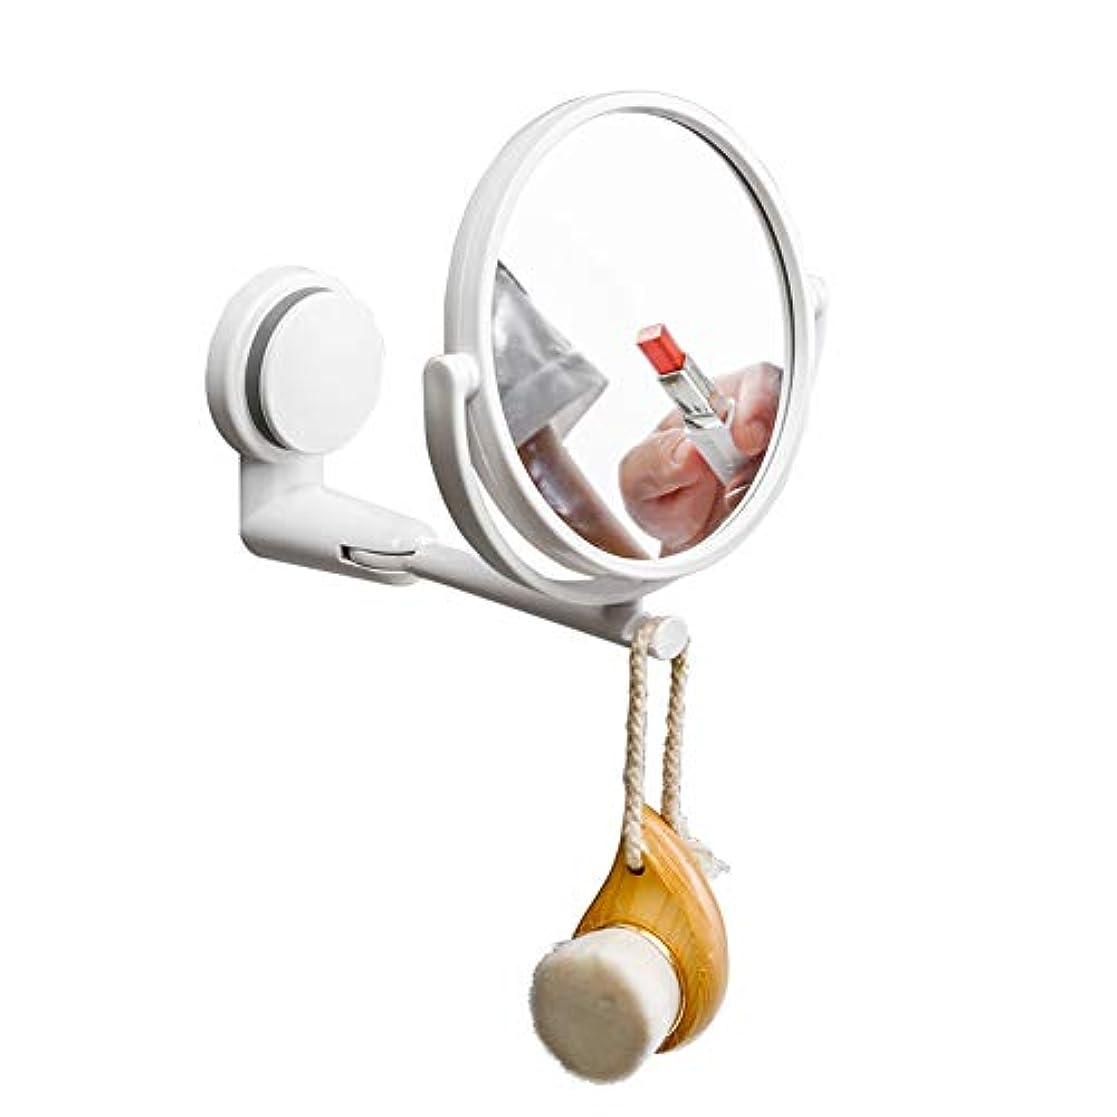 CatChi 壁付けミラー 両面化粧鏡 3倍拡大鏡 折りたたみ 360度回転 女優ミラー 吸盤式 お風呂 洗面所 アームミラー 取り付け簡単